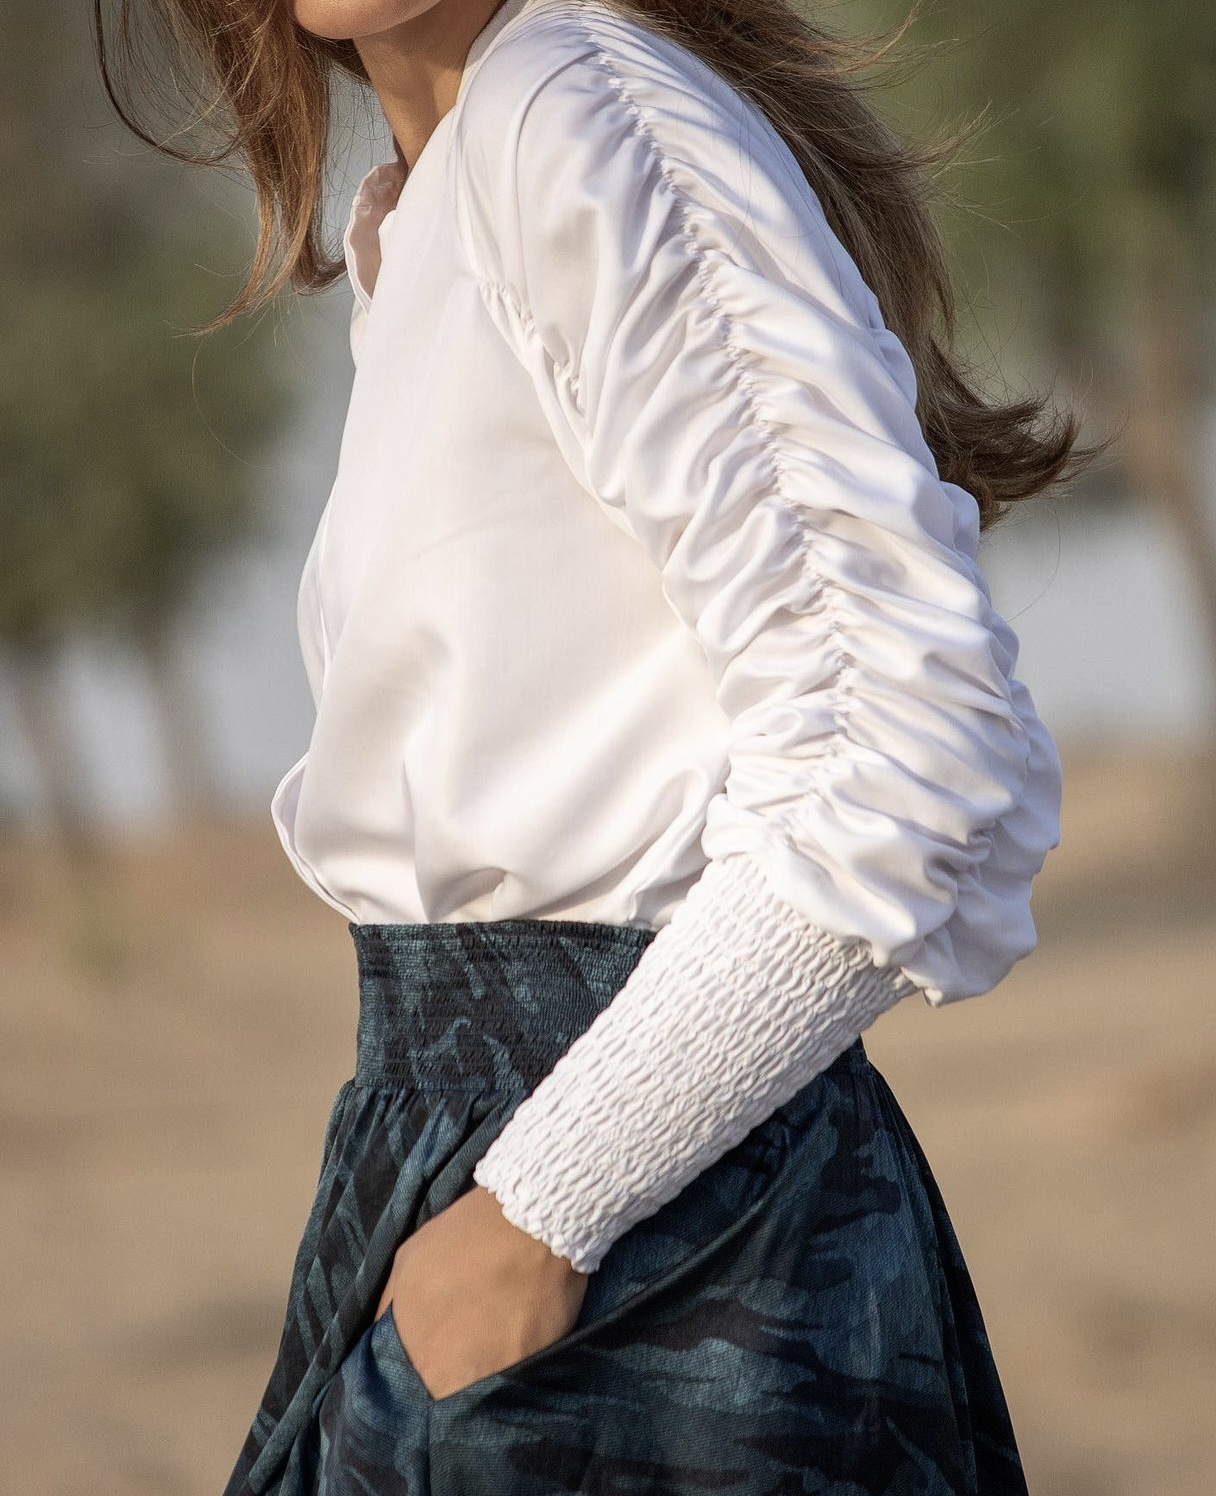 KARMAMIA Morgan Shirt – White Cotton IMAGE BY ME